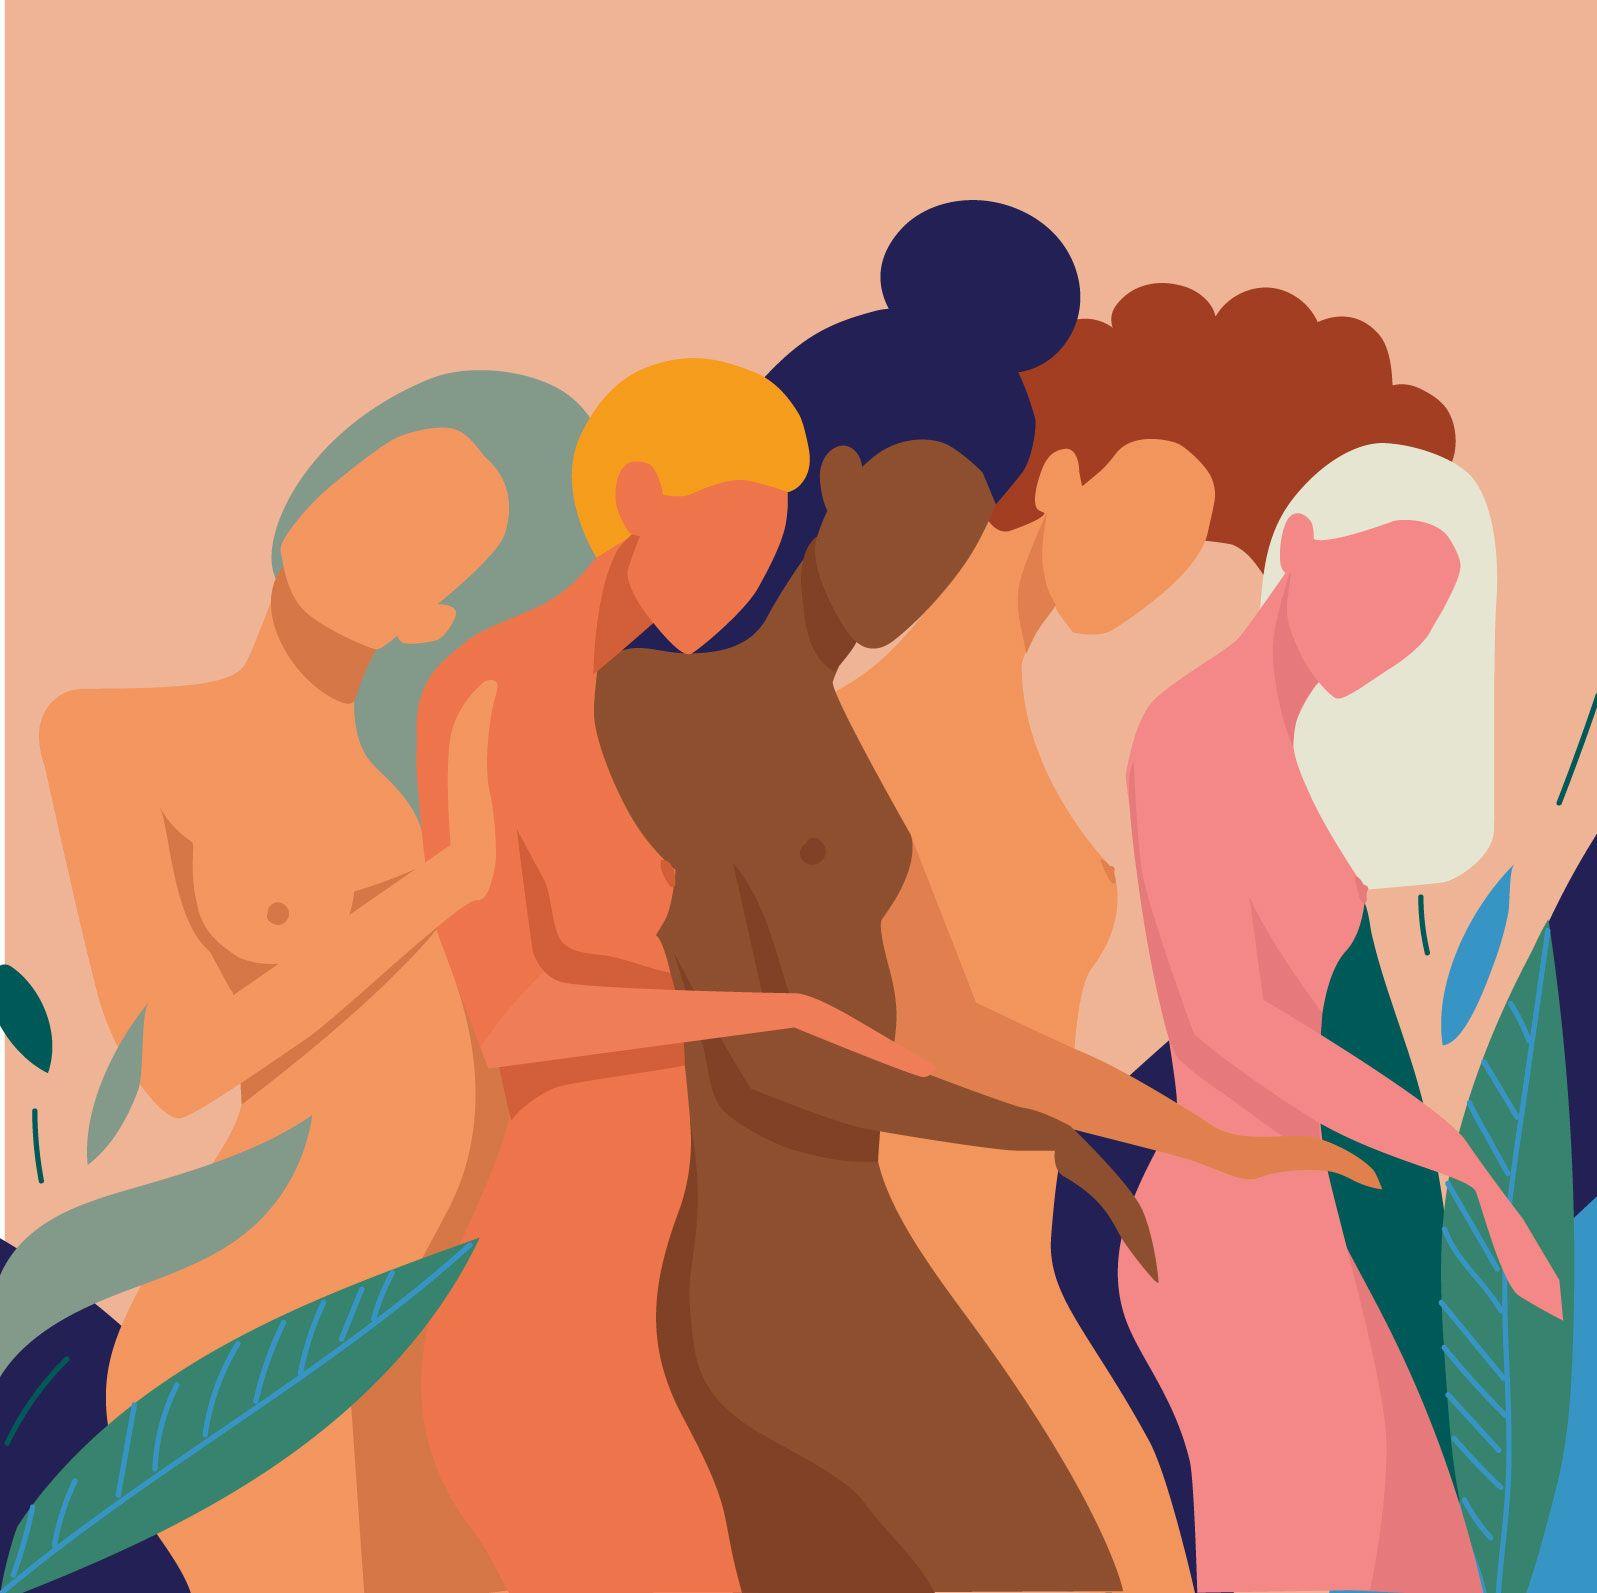 garance-illustration-Irina-Kruglova-Women